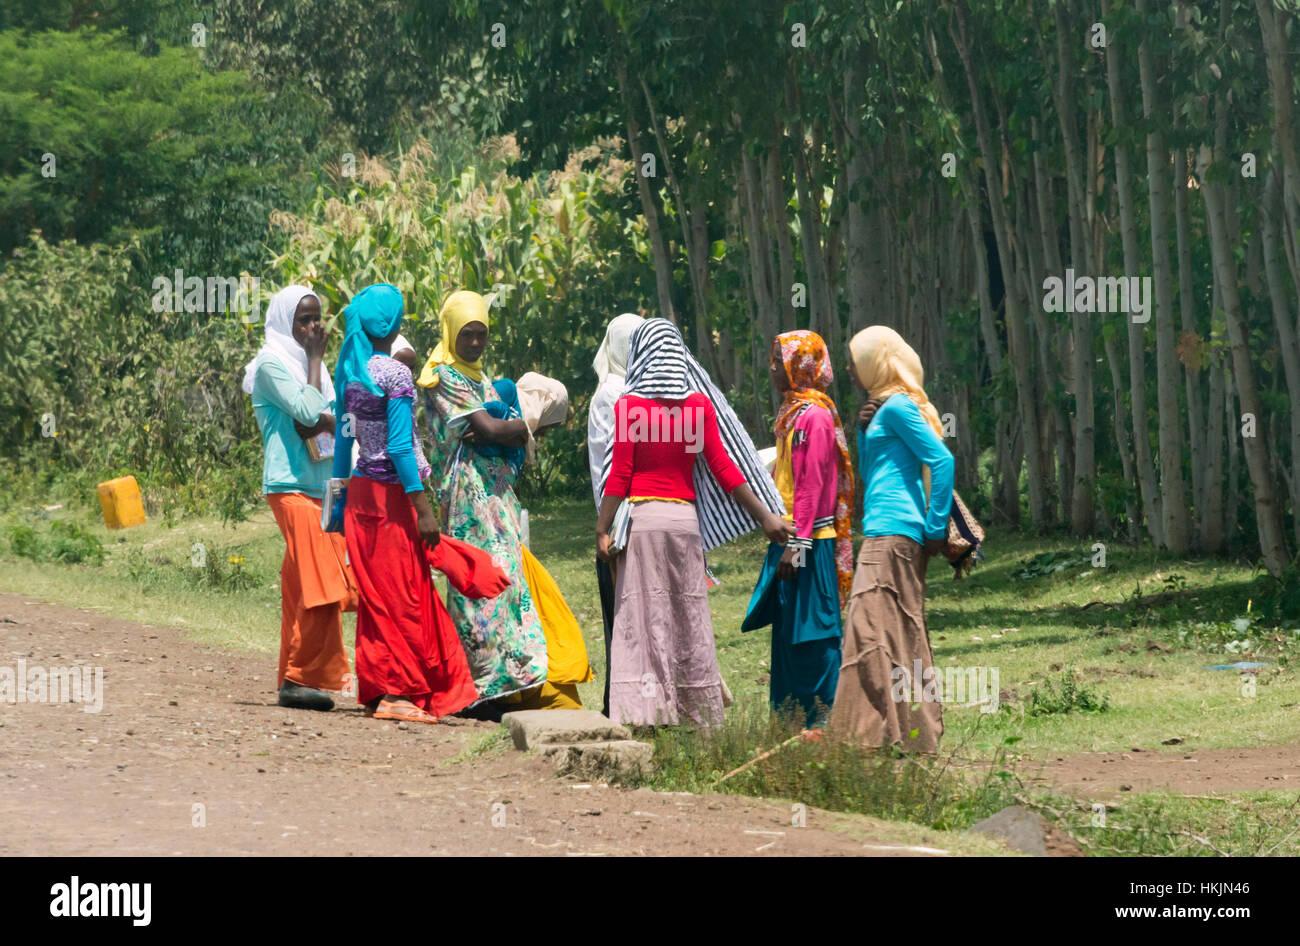 Women traveling along the road, Ethiopia - Stock Image